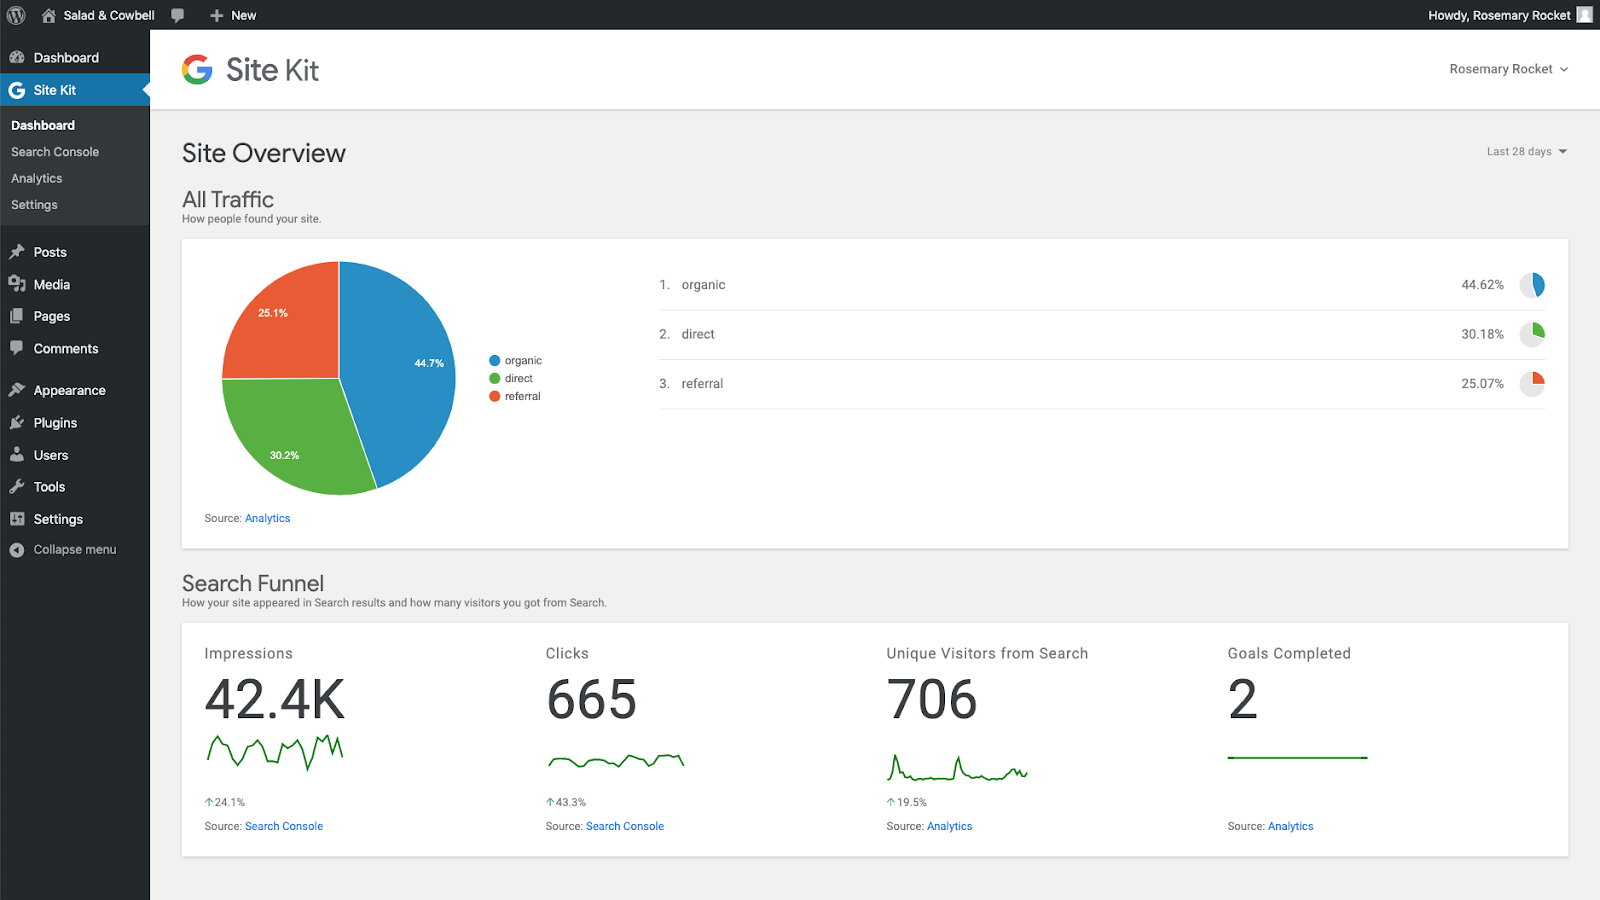 Site Kit by Google - 整合所有 Google 產品服務於 WordPress 網站當中 1